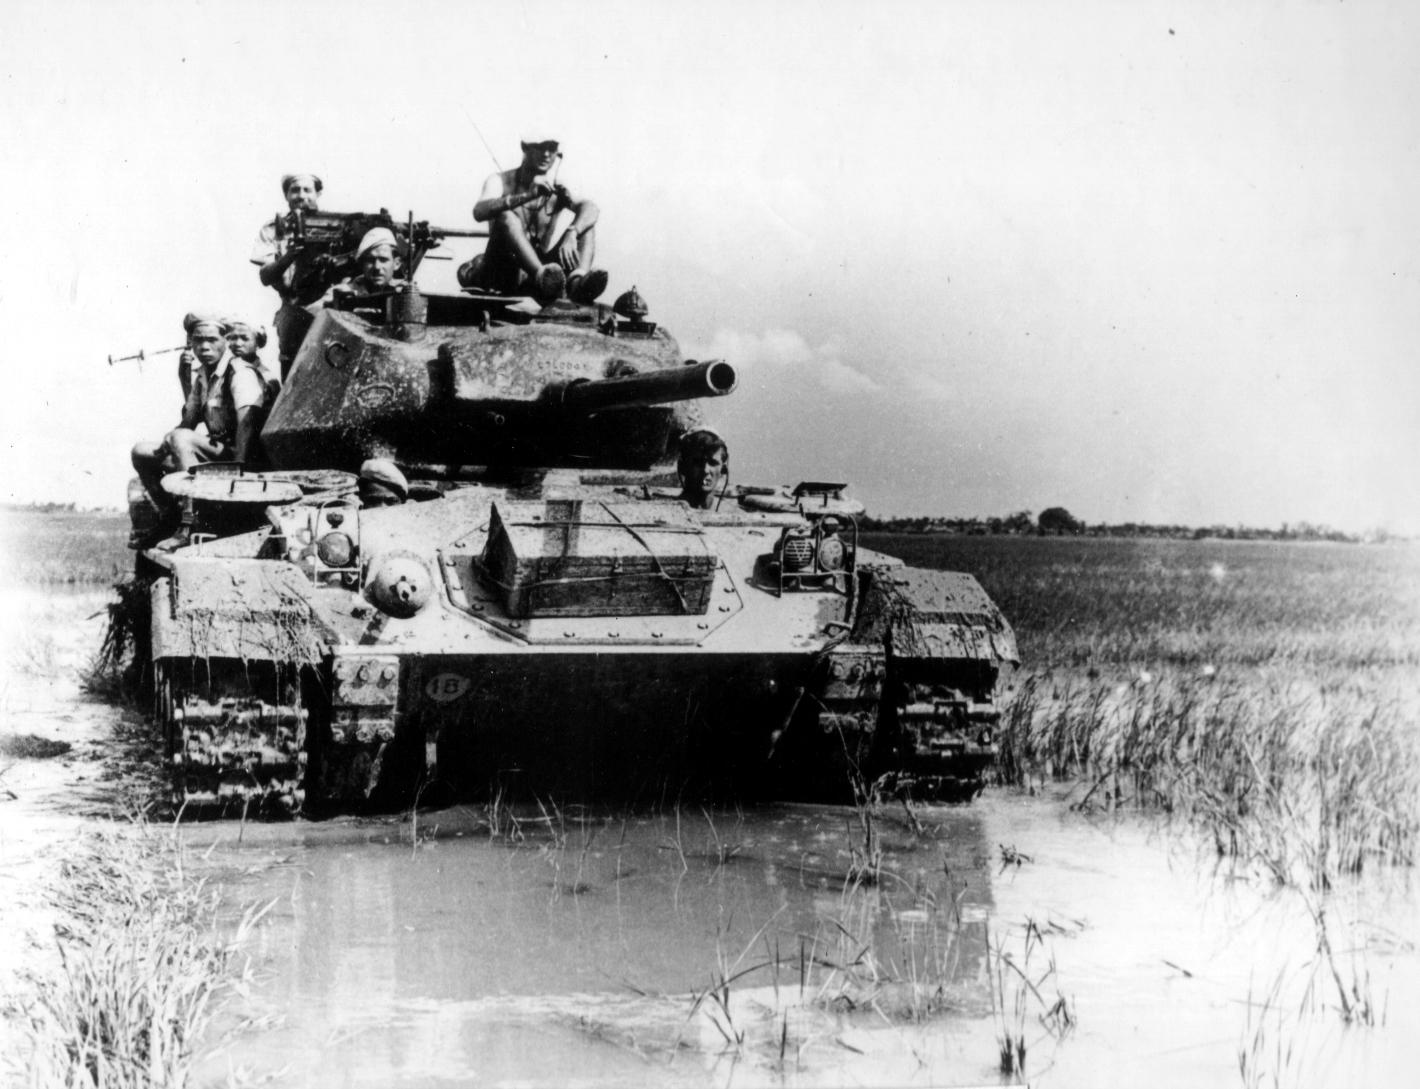 Лёгкий танк M24 Chaffee на французкой службе, район Дьенбьенфу.jpg